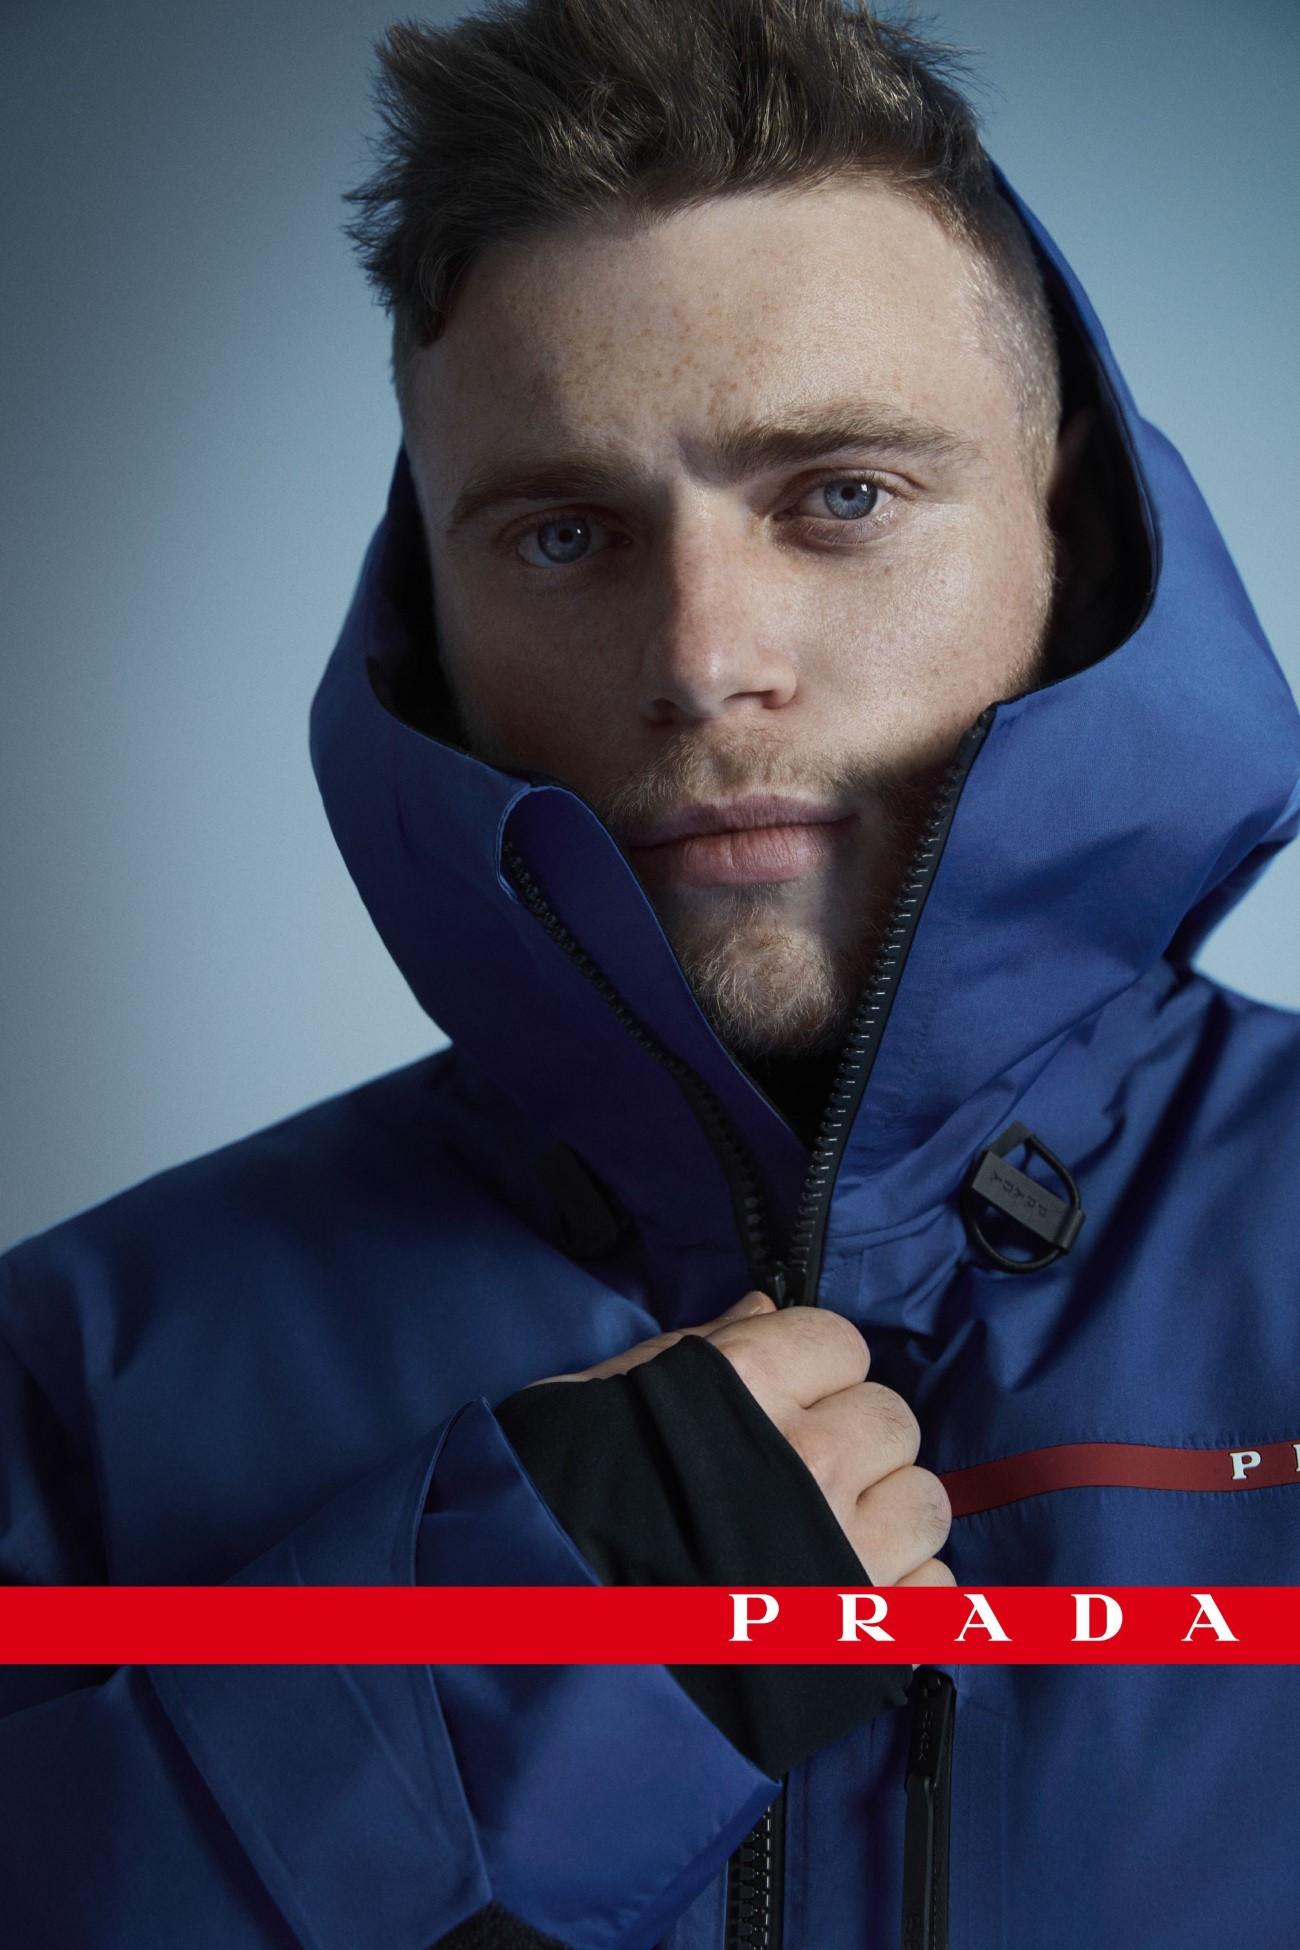 Prada Linea Rossa x Gus Kenworthy - Campagne Automne-Hiver 2020